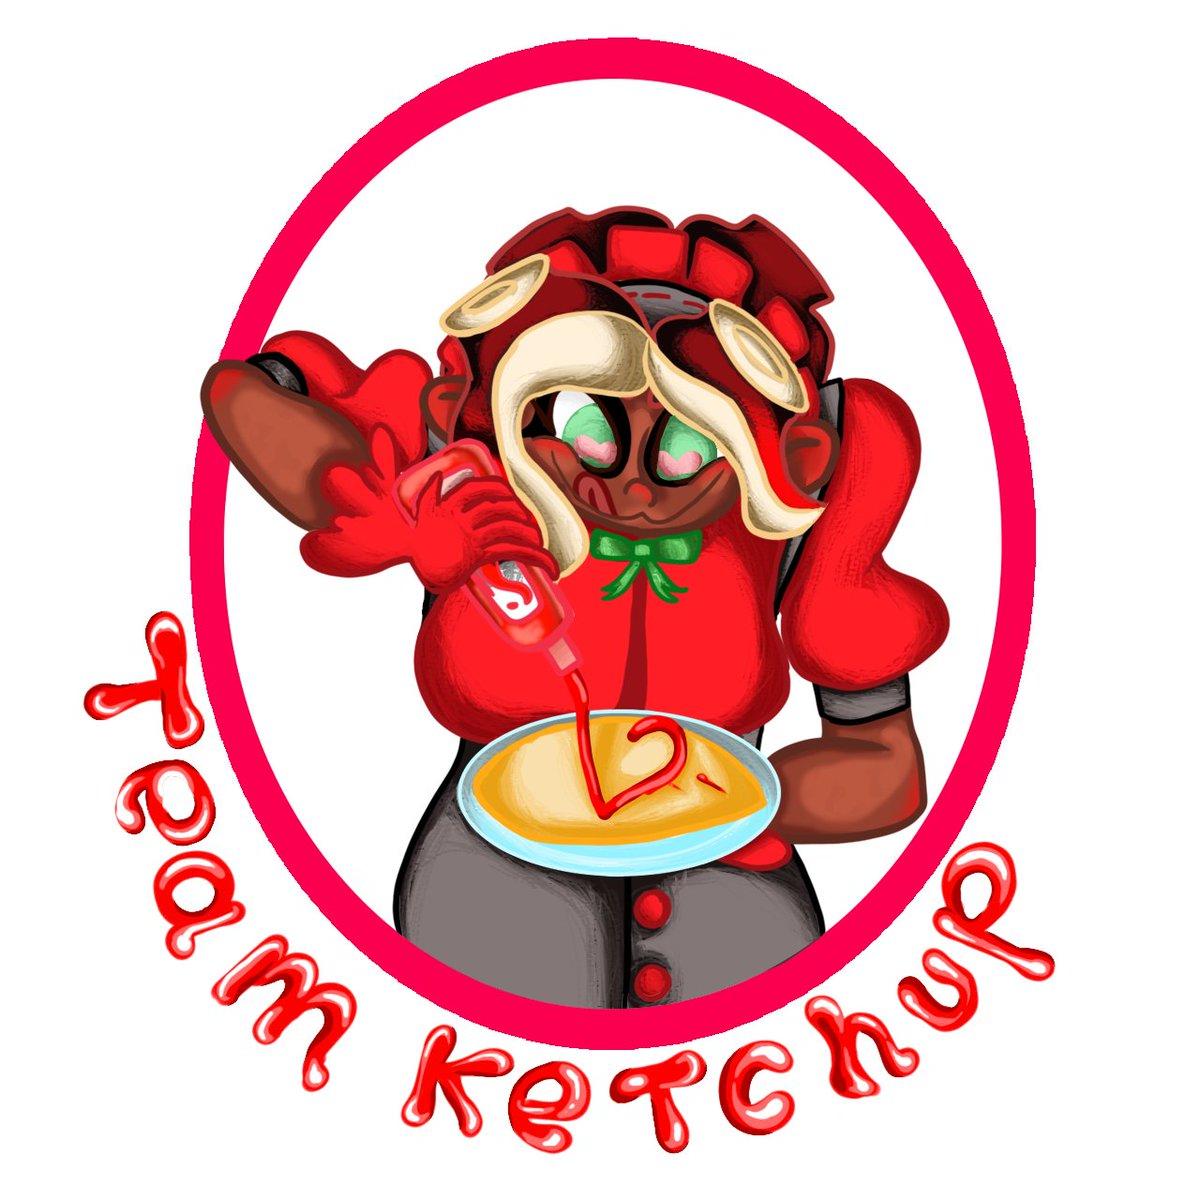 Okay, They're both done. One for each team. #TeamKetchup #TeamMayo #Splatfest #splatfest2020 #fanart #Splatoon2 #pearlandmarina